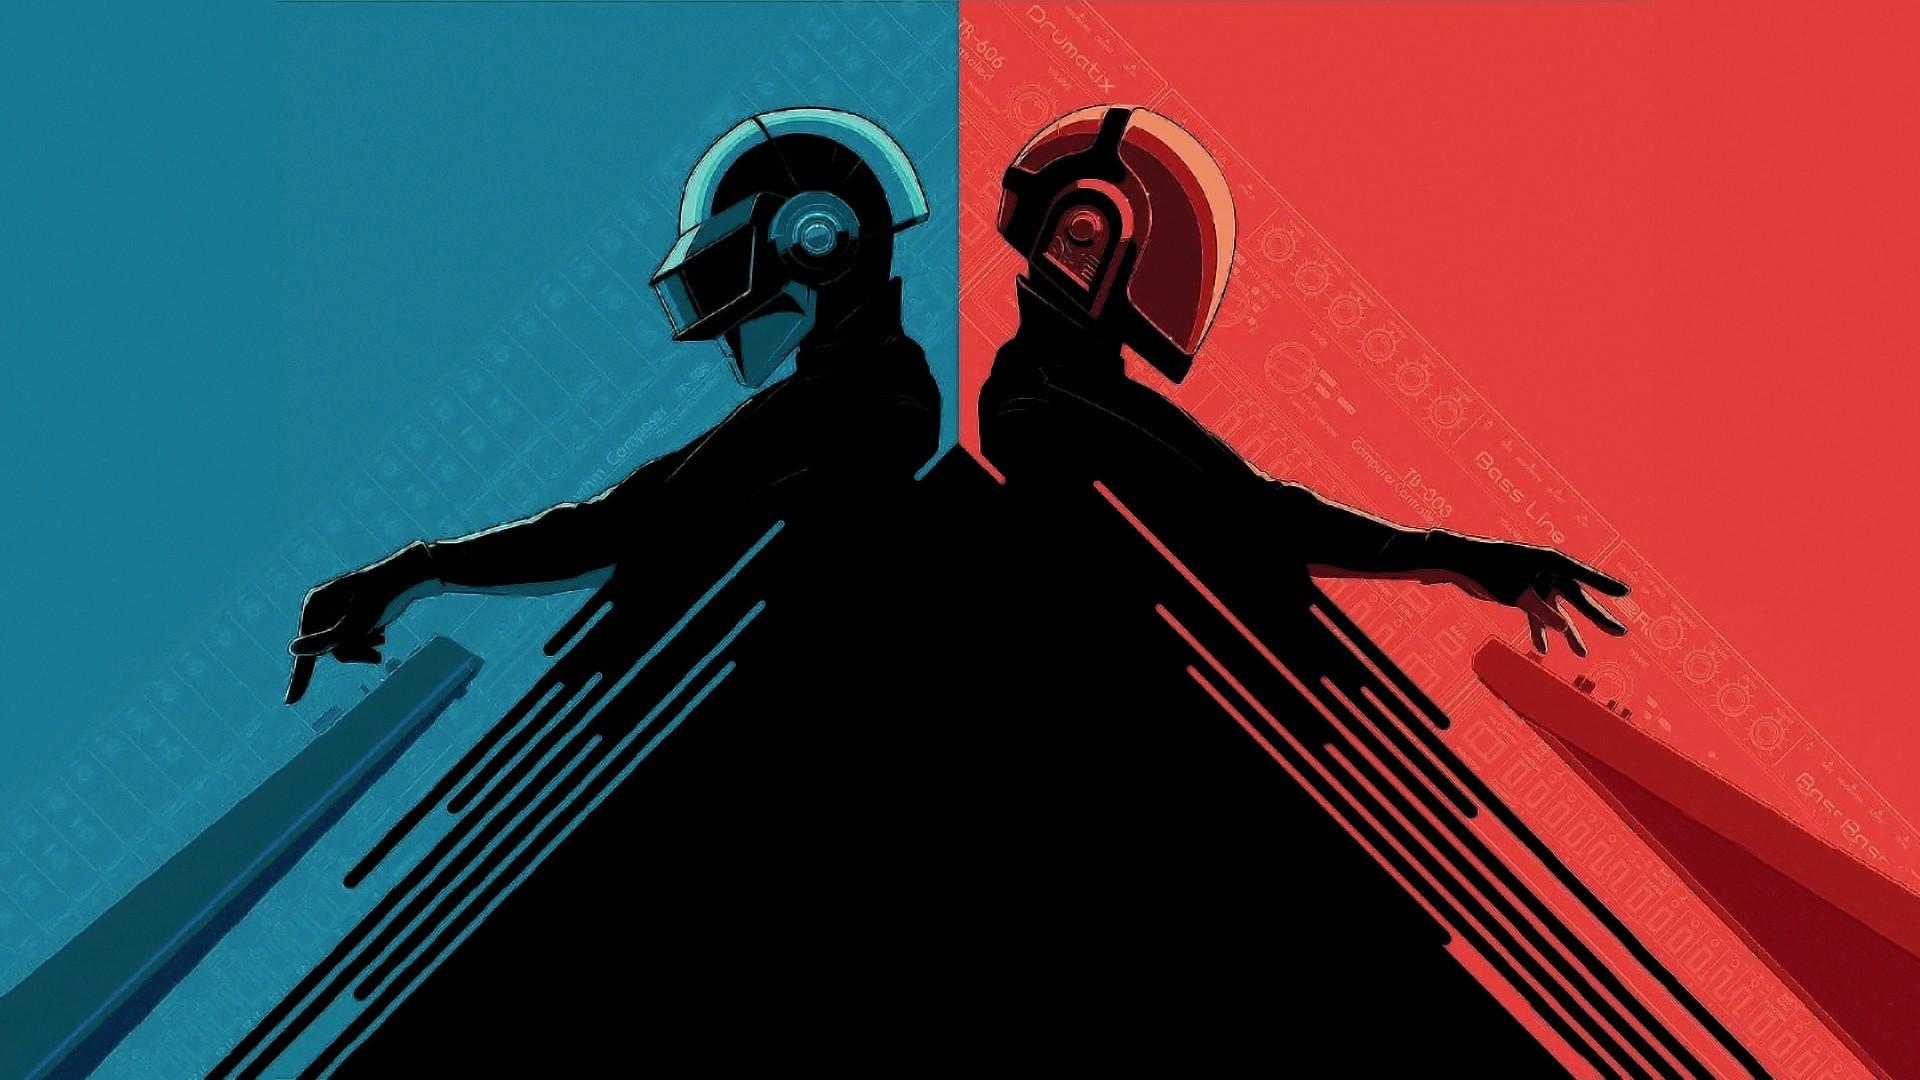 Daft Punk hd wallpaper download